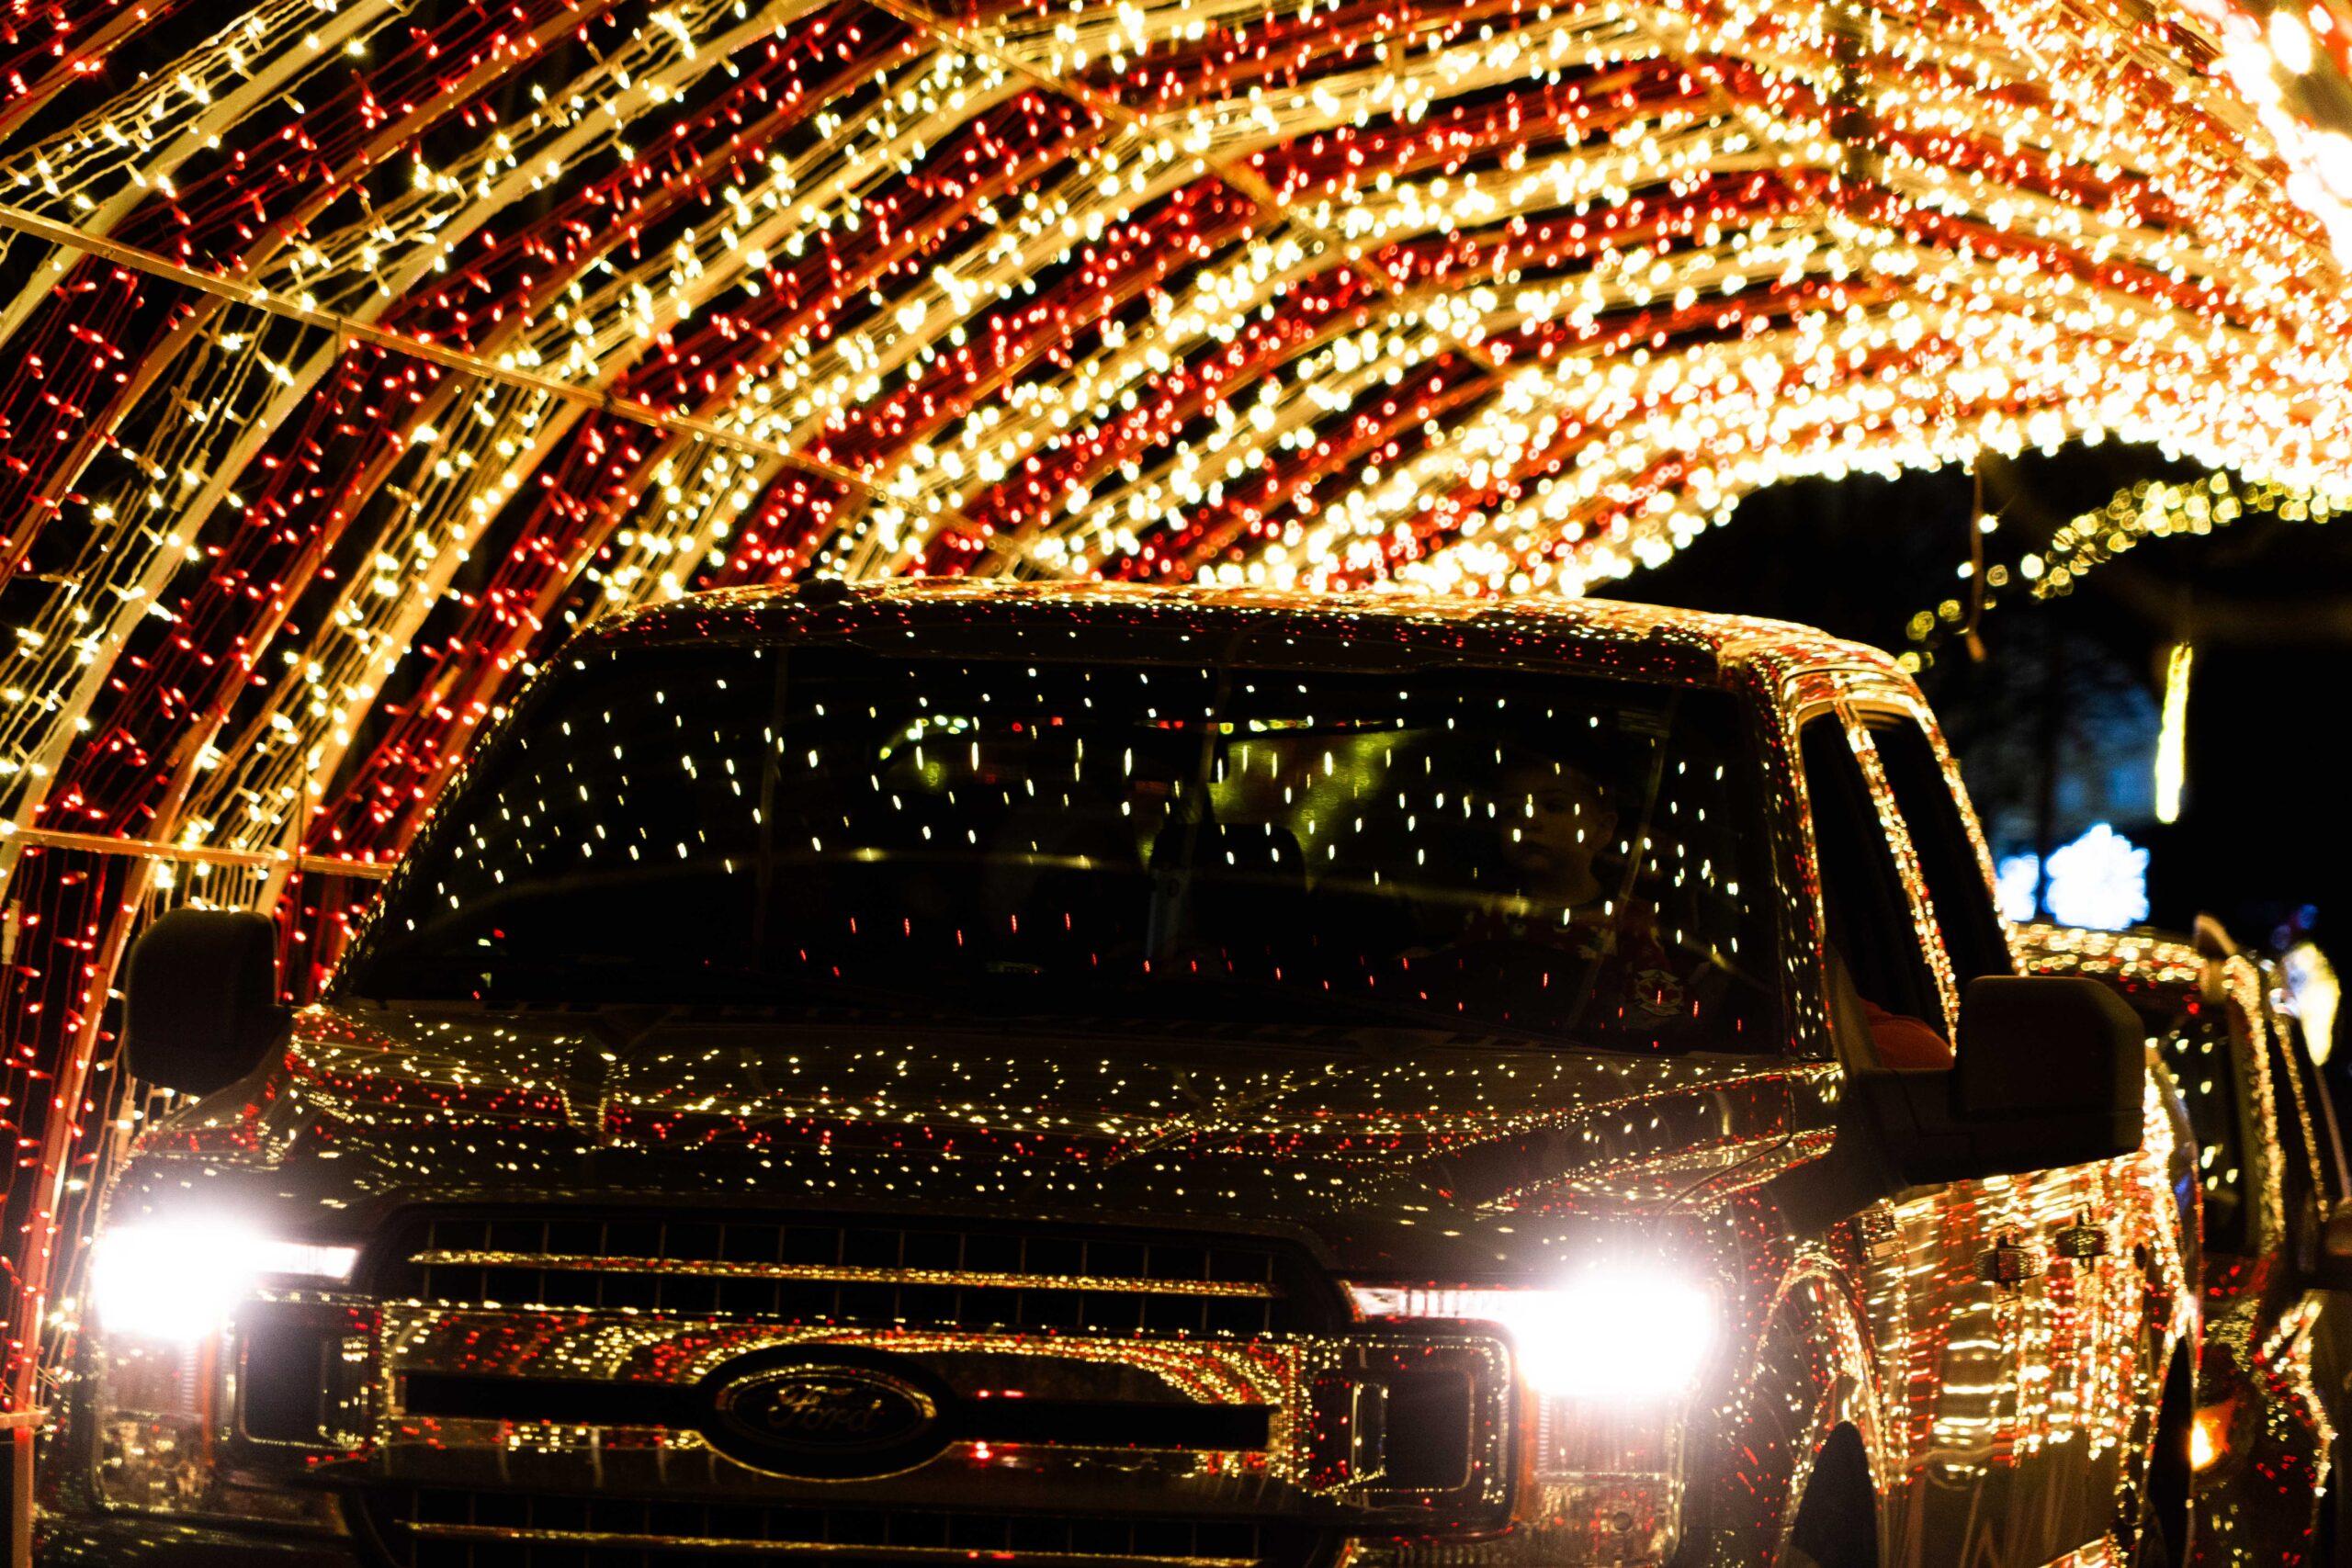 car going through a light tunnel